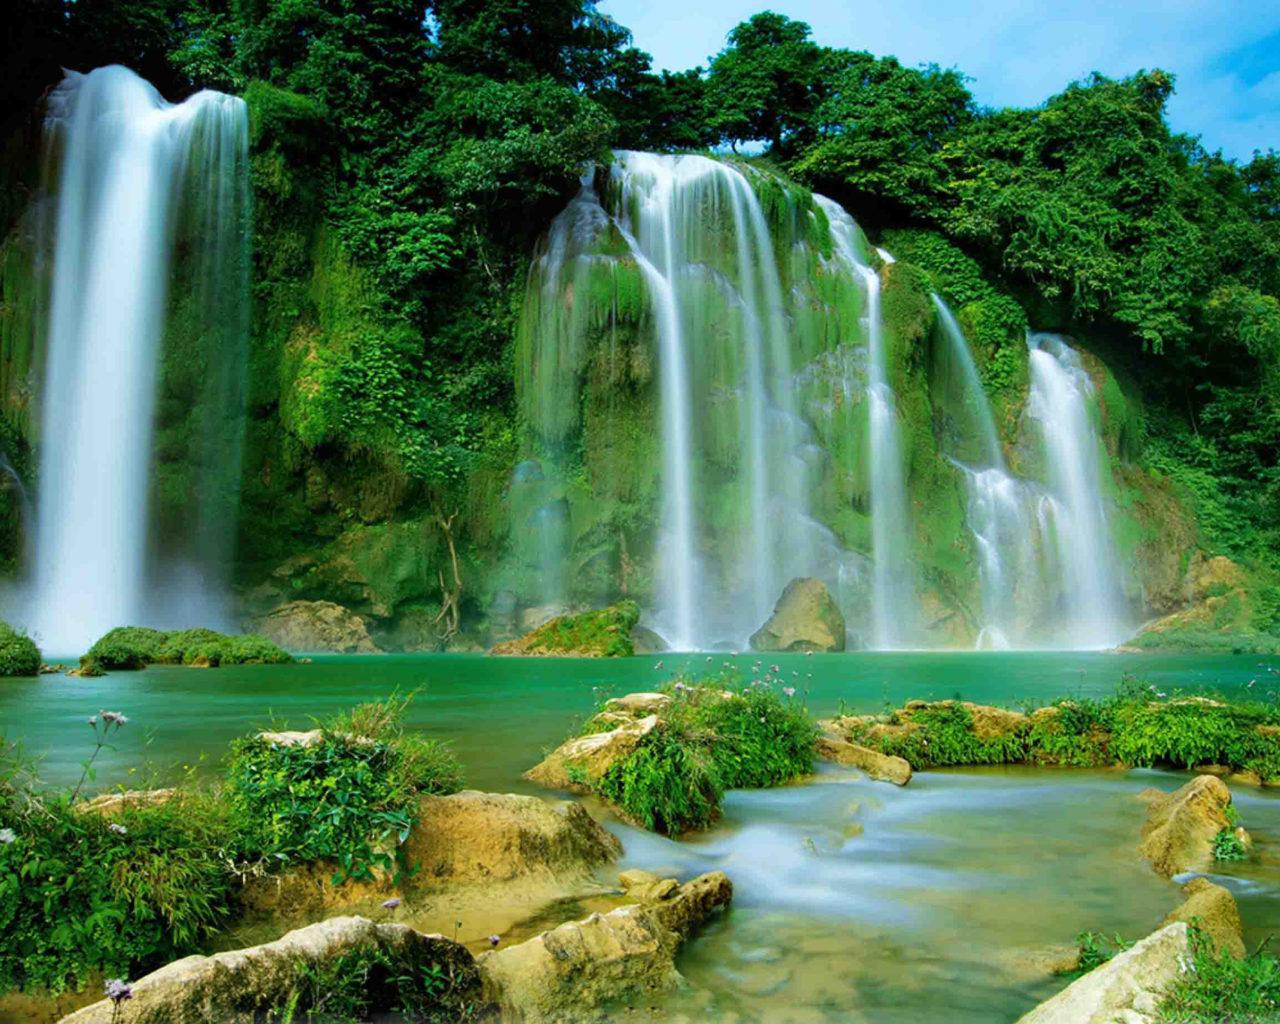 Niagara Falls Hd Wallpaper Ba Be Lake Ban Gioc Detian Falls Vietnam And China Hd